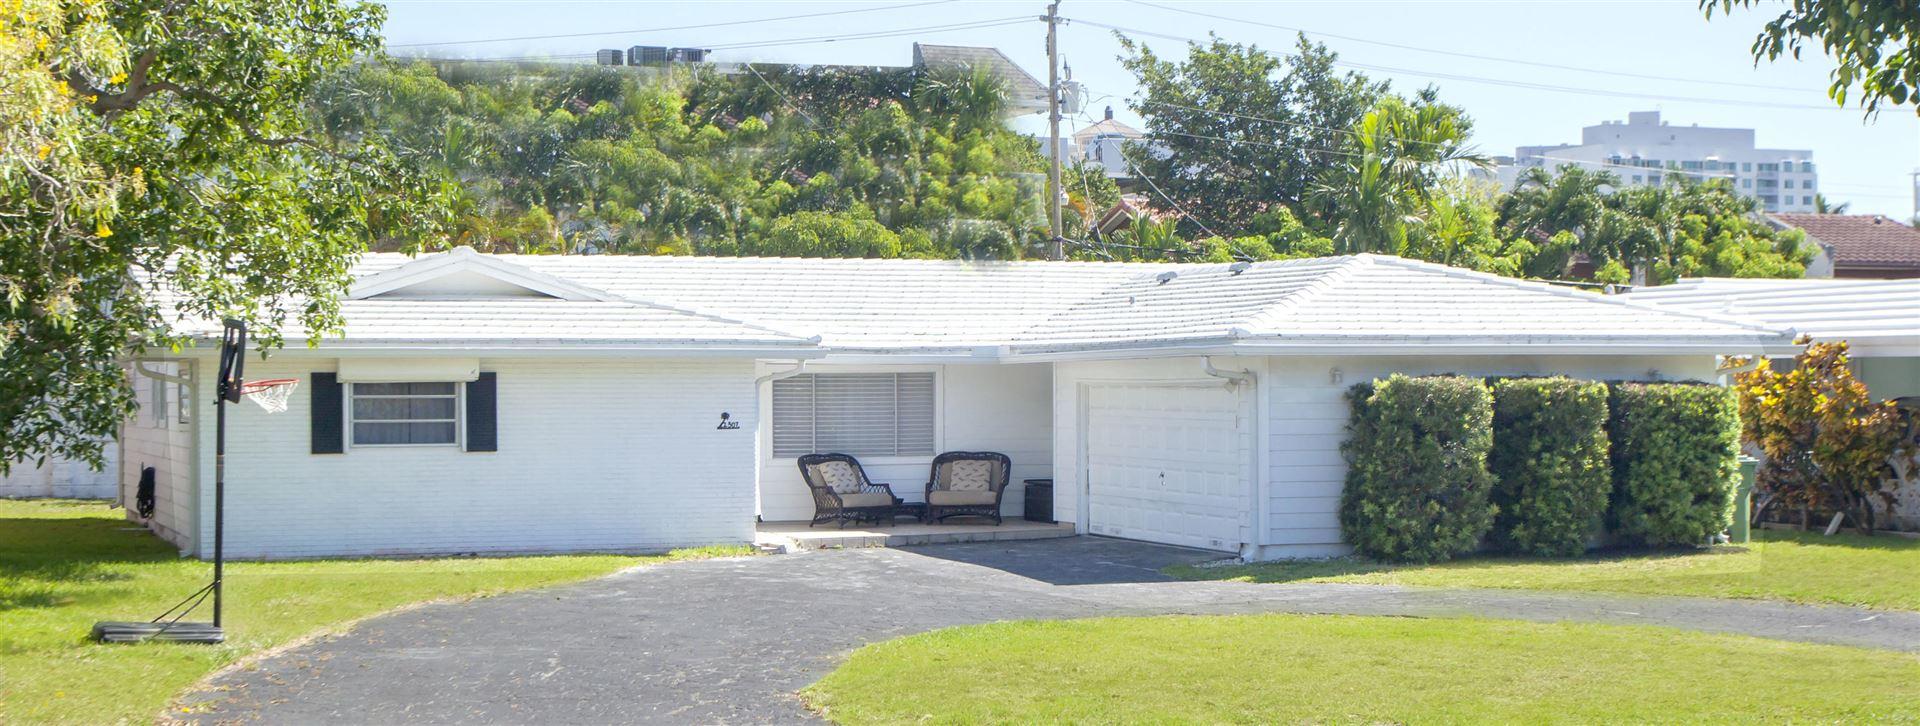 2507 NE 8th Street, Fort Lauderdale, FL 33304 - #: RX-10623063